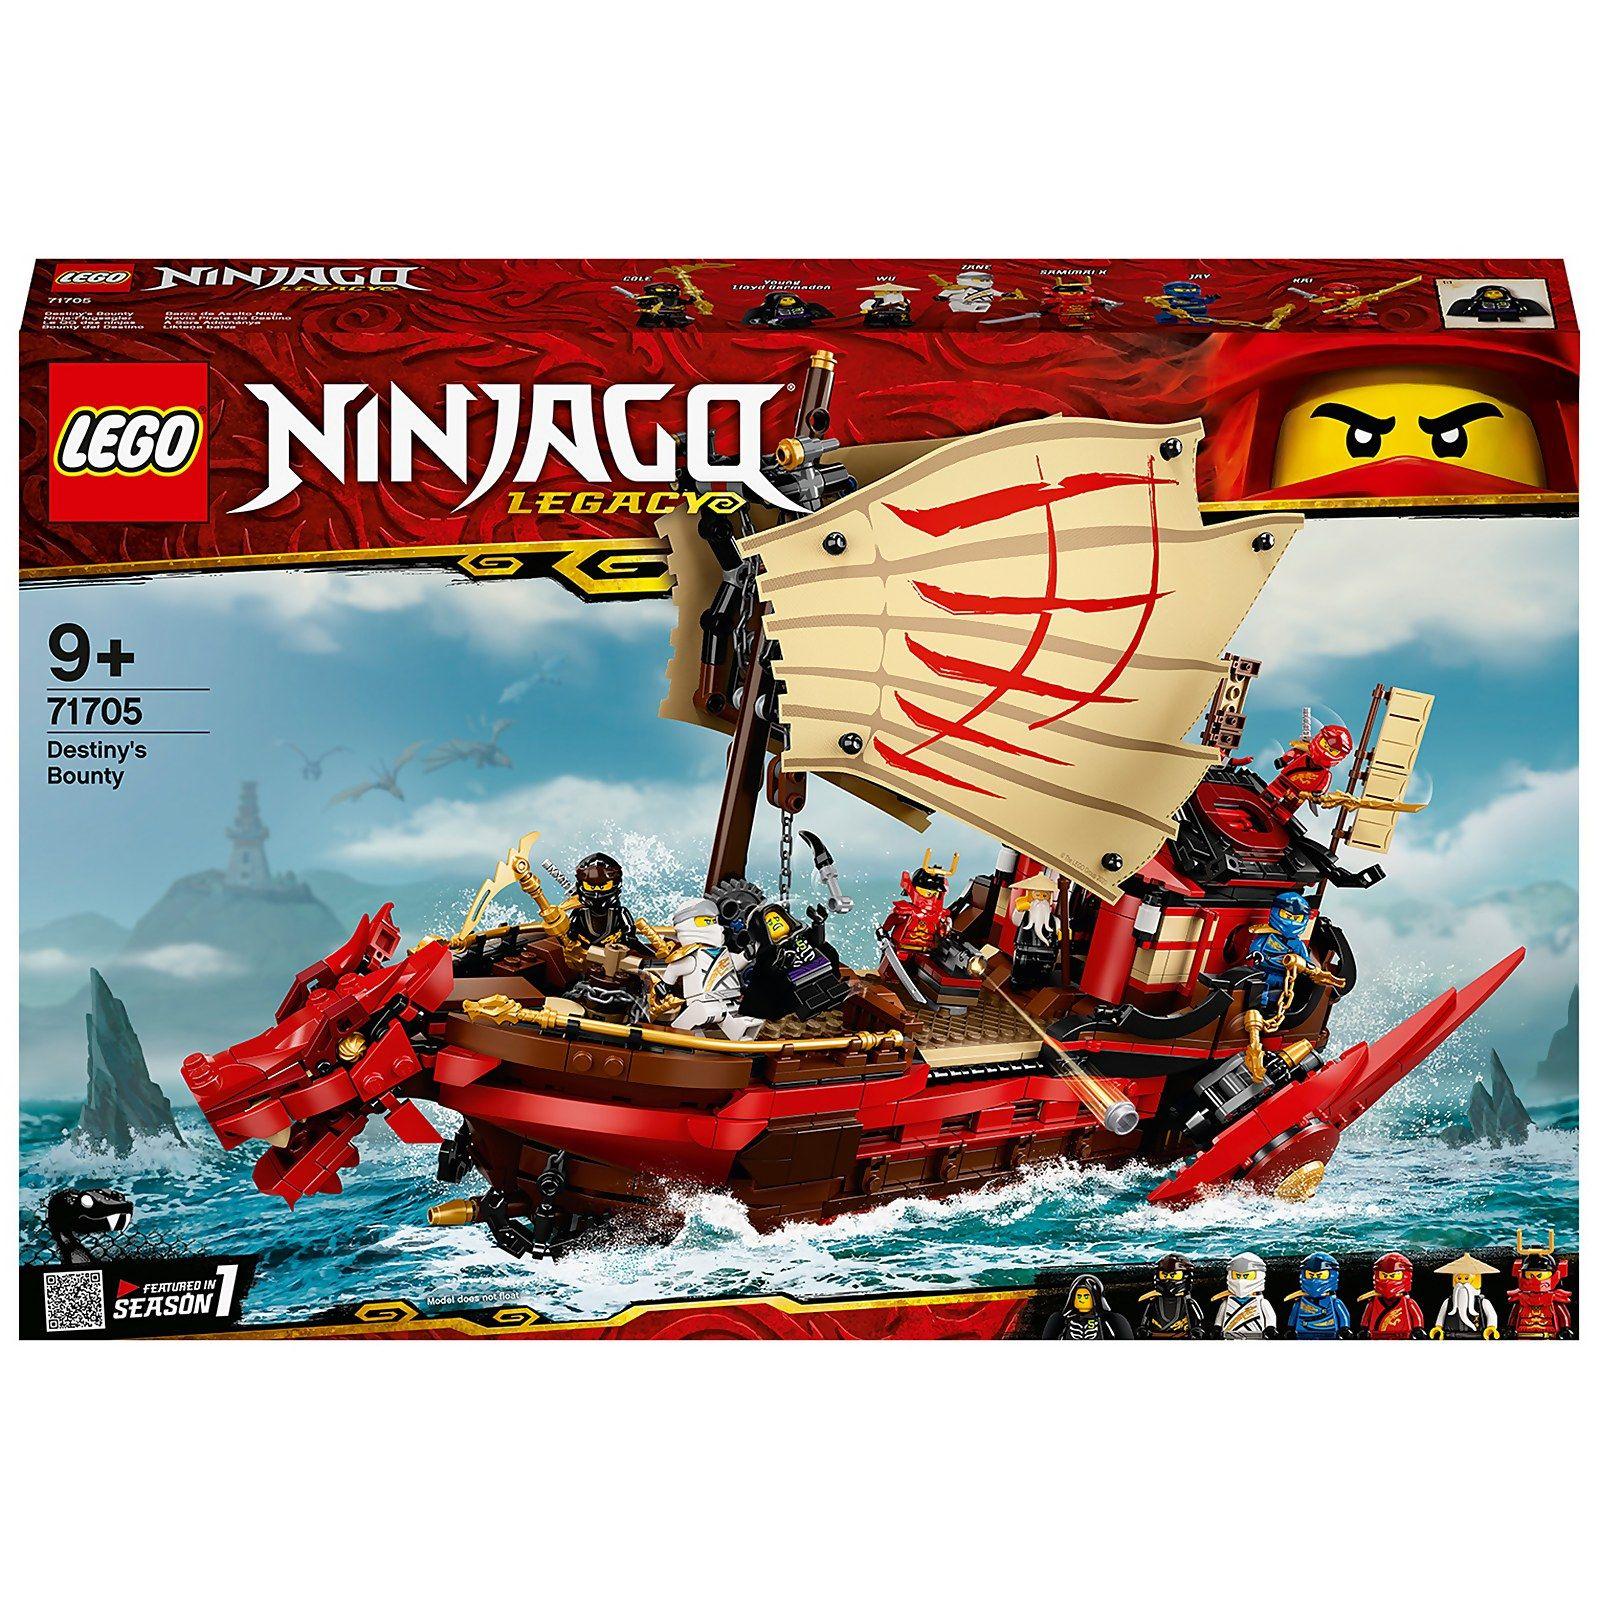 LEGO Ninjago 71705 Ninja-Flugsegler VSK-frei